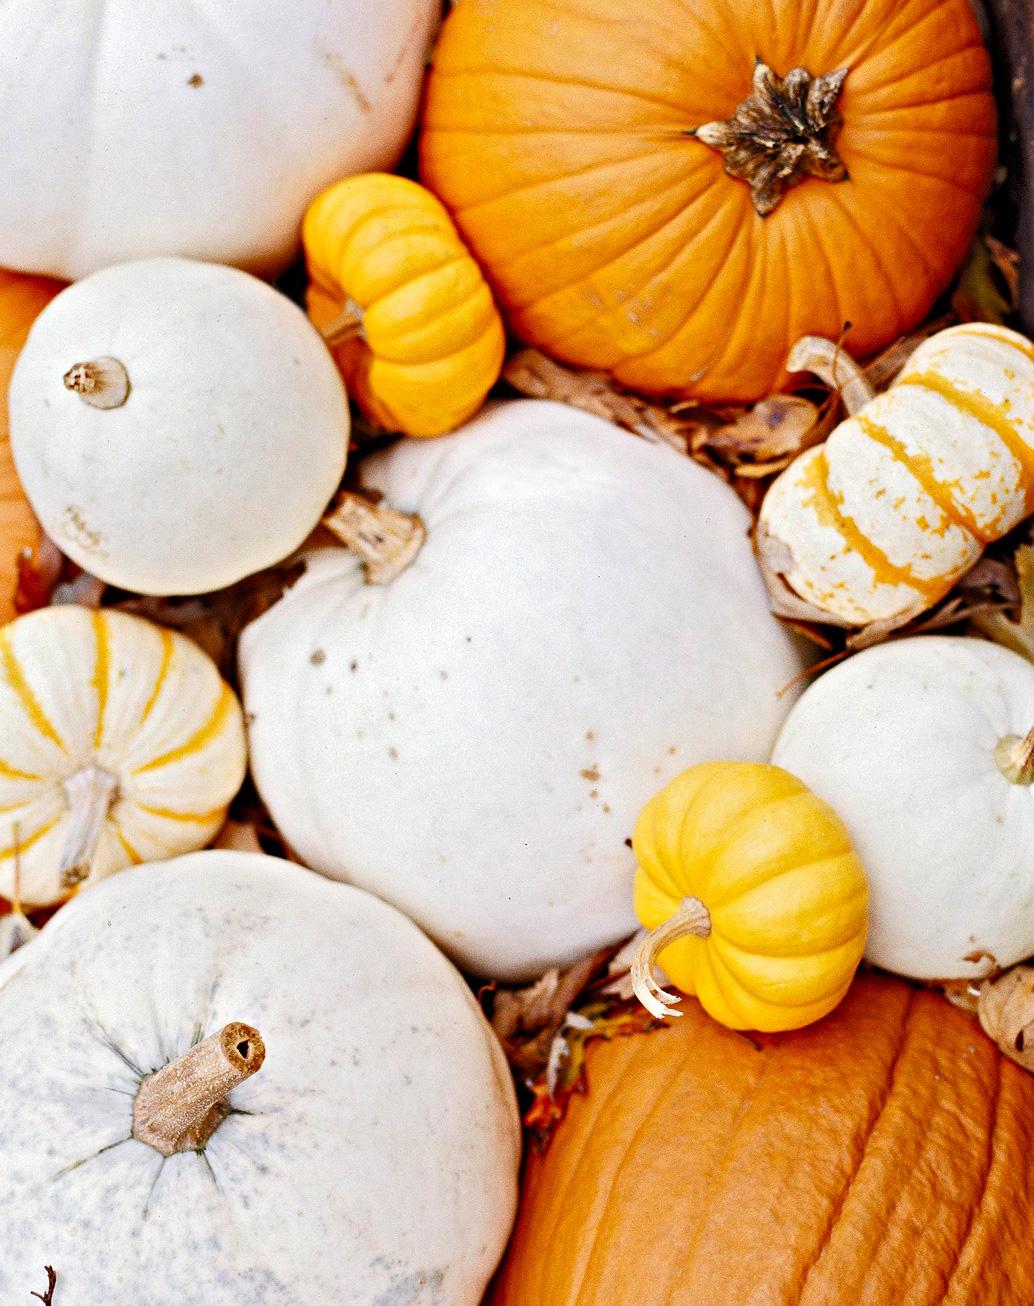 Pumpkin picks